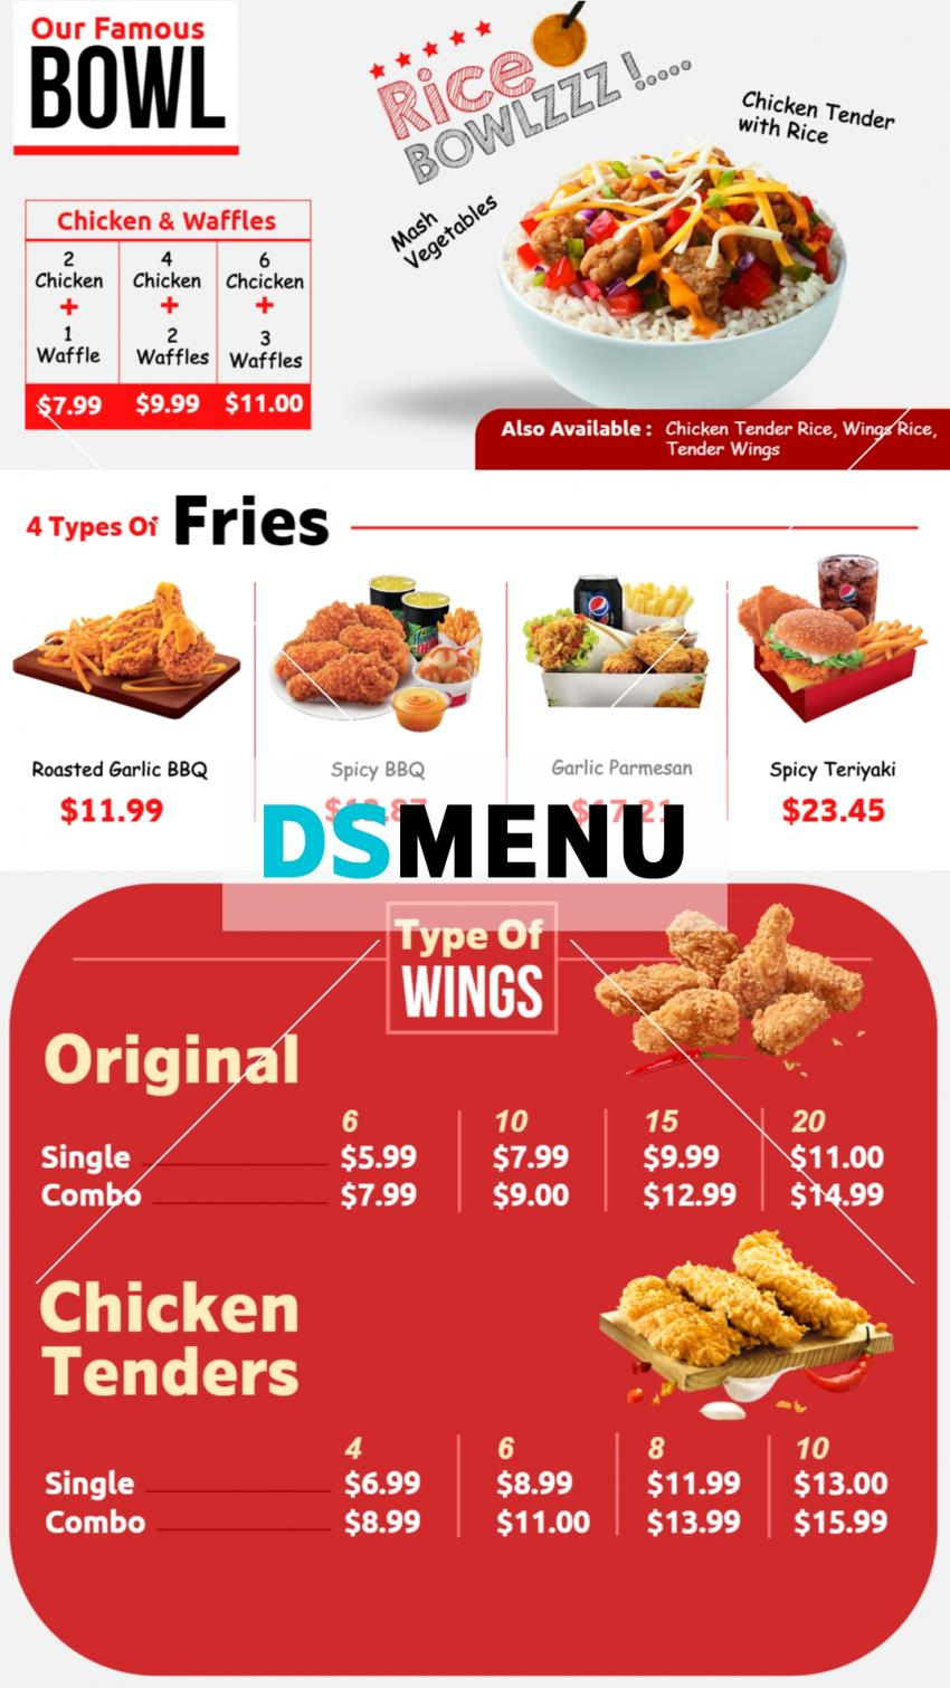 How to make restaurant menu online easily